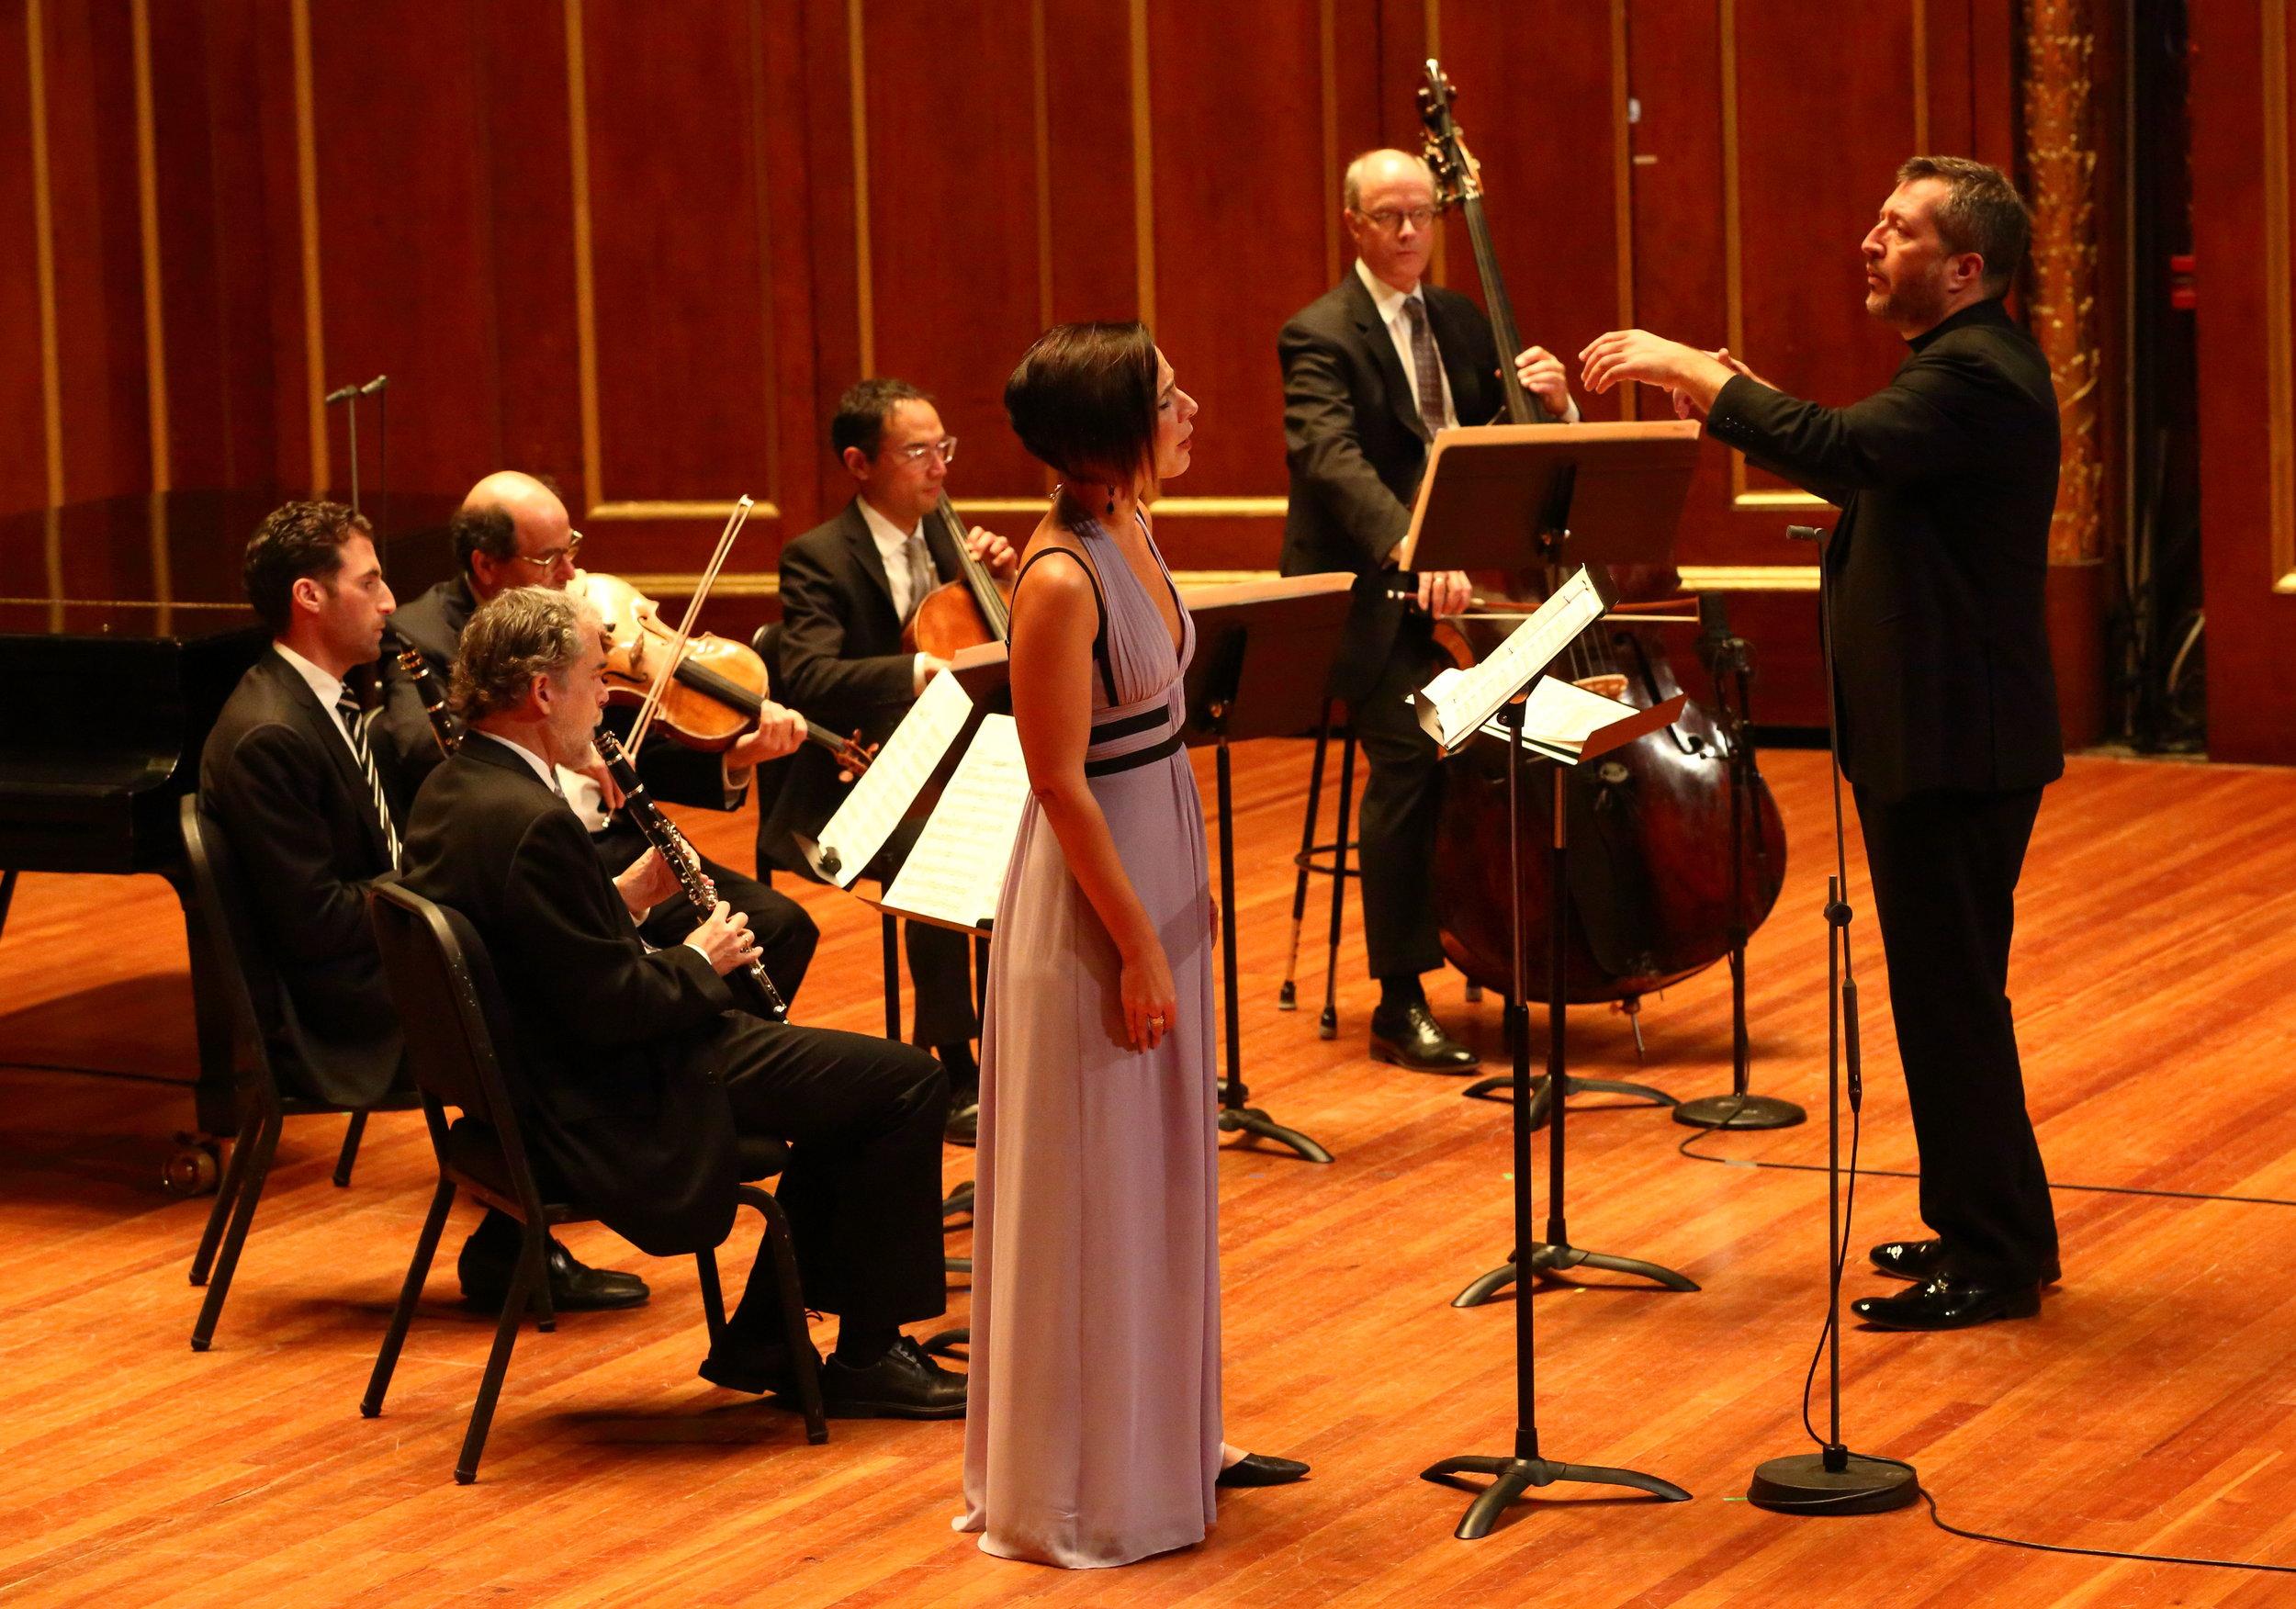 Thomas Adès conducts the Boston Symphony Chamber Players and mezzo Kelly O'Connor, Sunday, Oct. 30 at Jordan Hall. Hilary Scott photograph